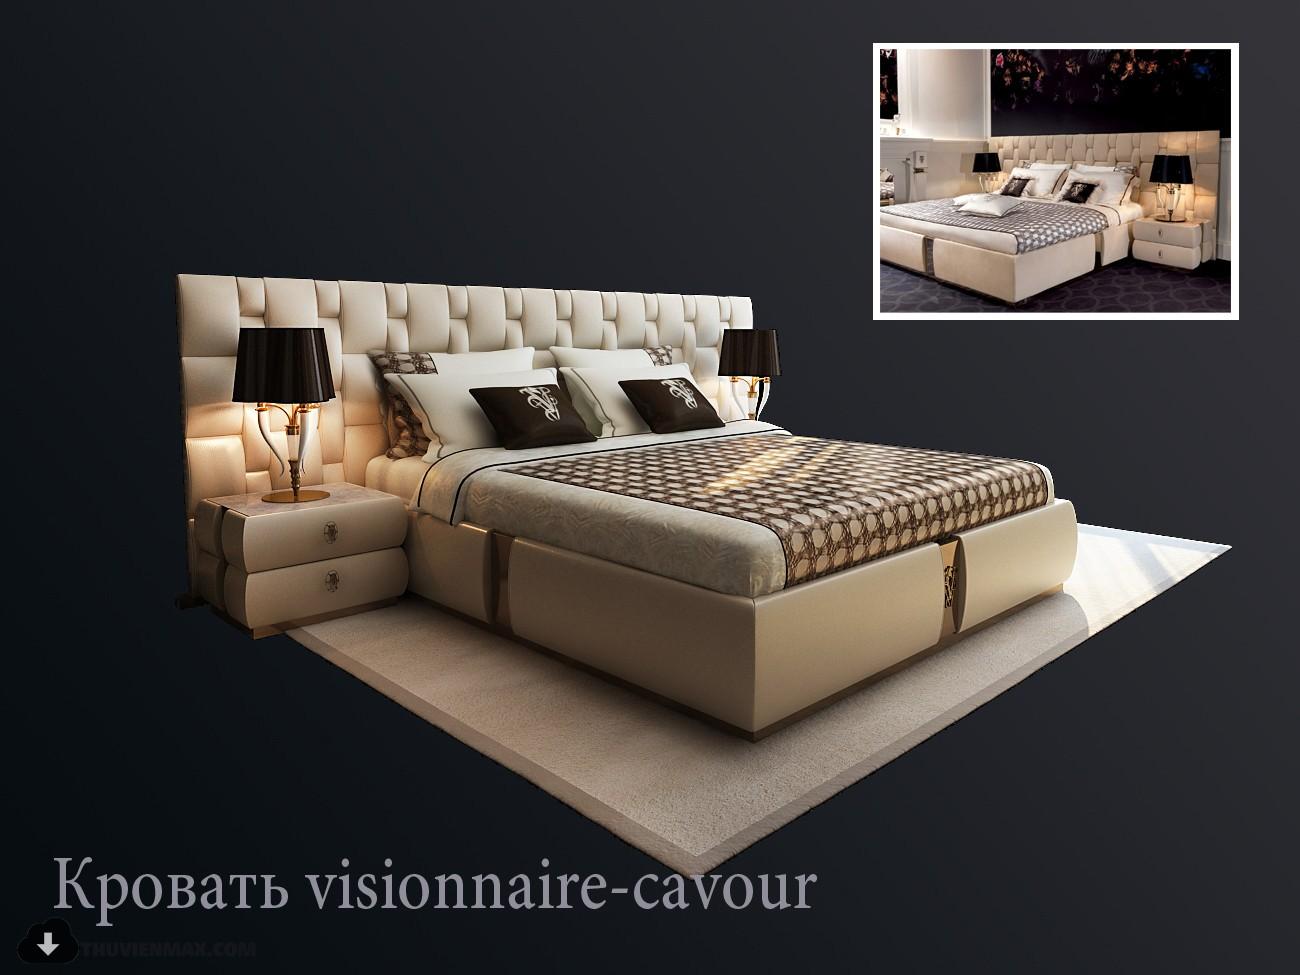 d9ax pro 2 - مجموعه مدل سه بعدی تخت خواب شماره 4